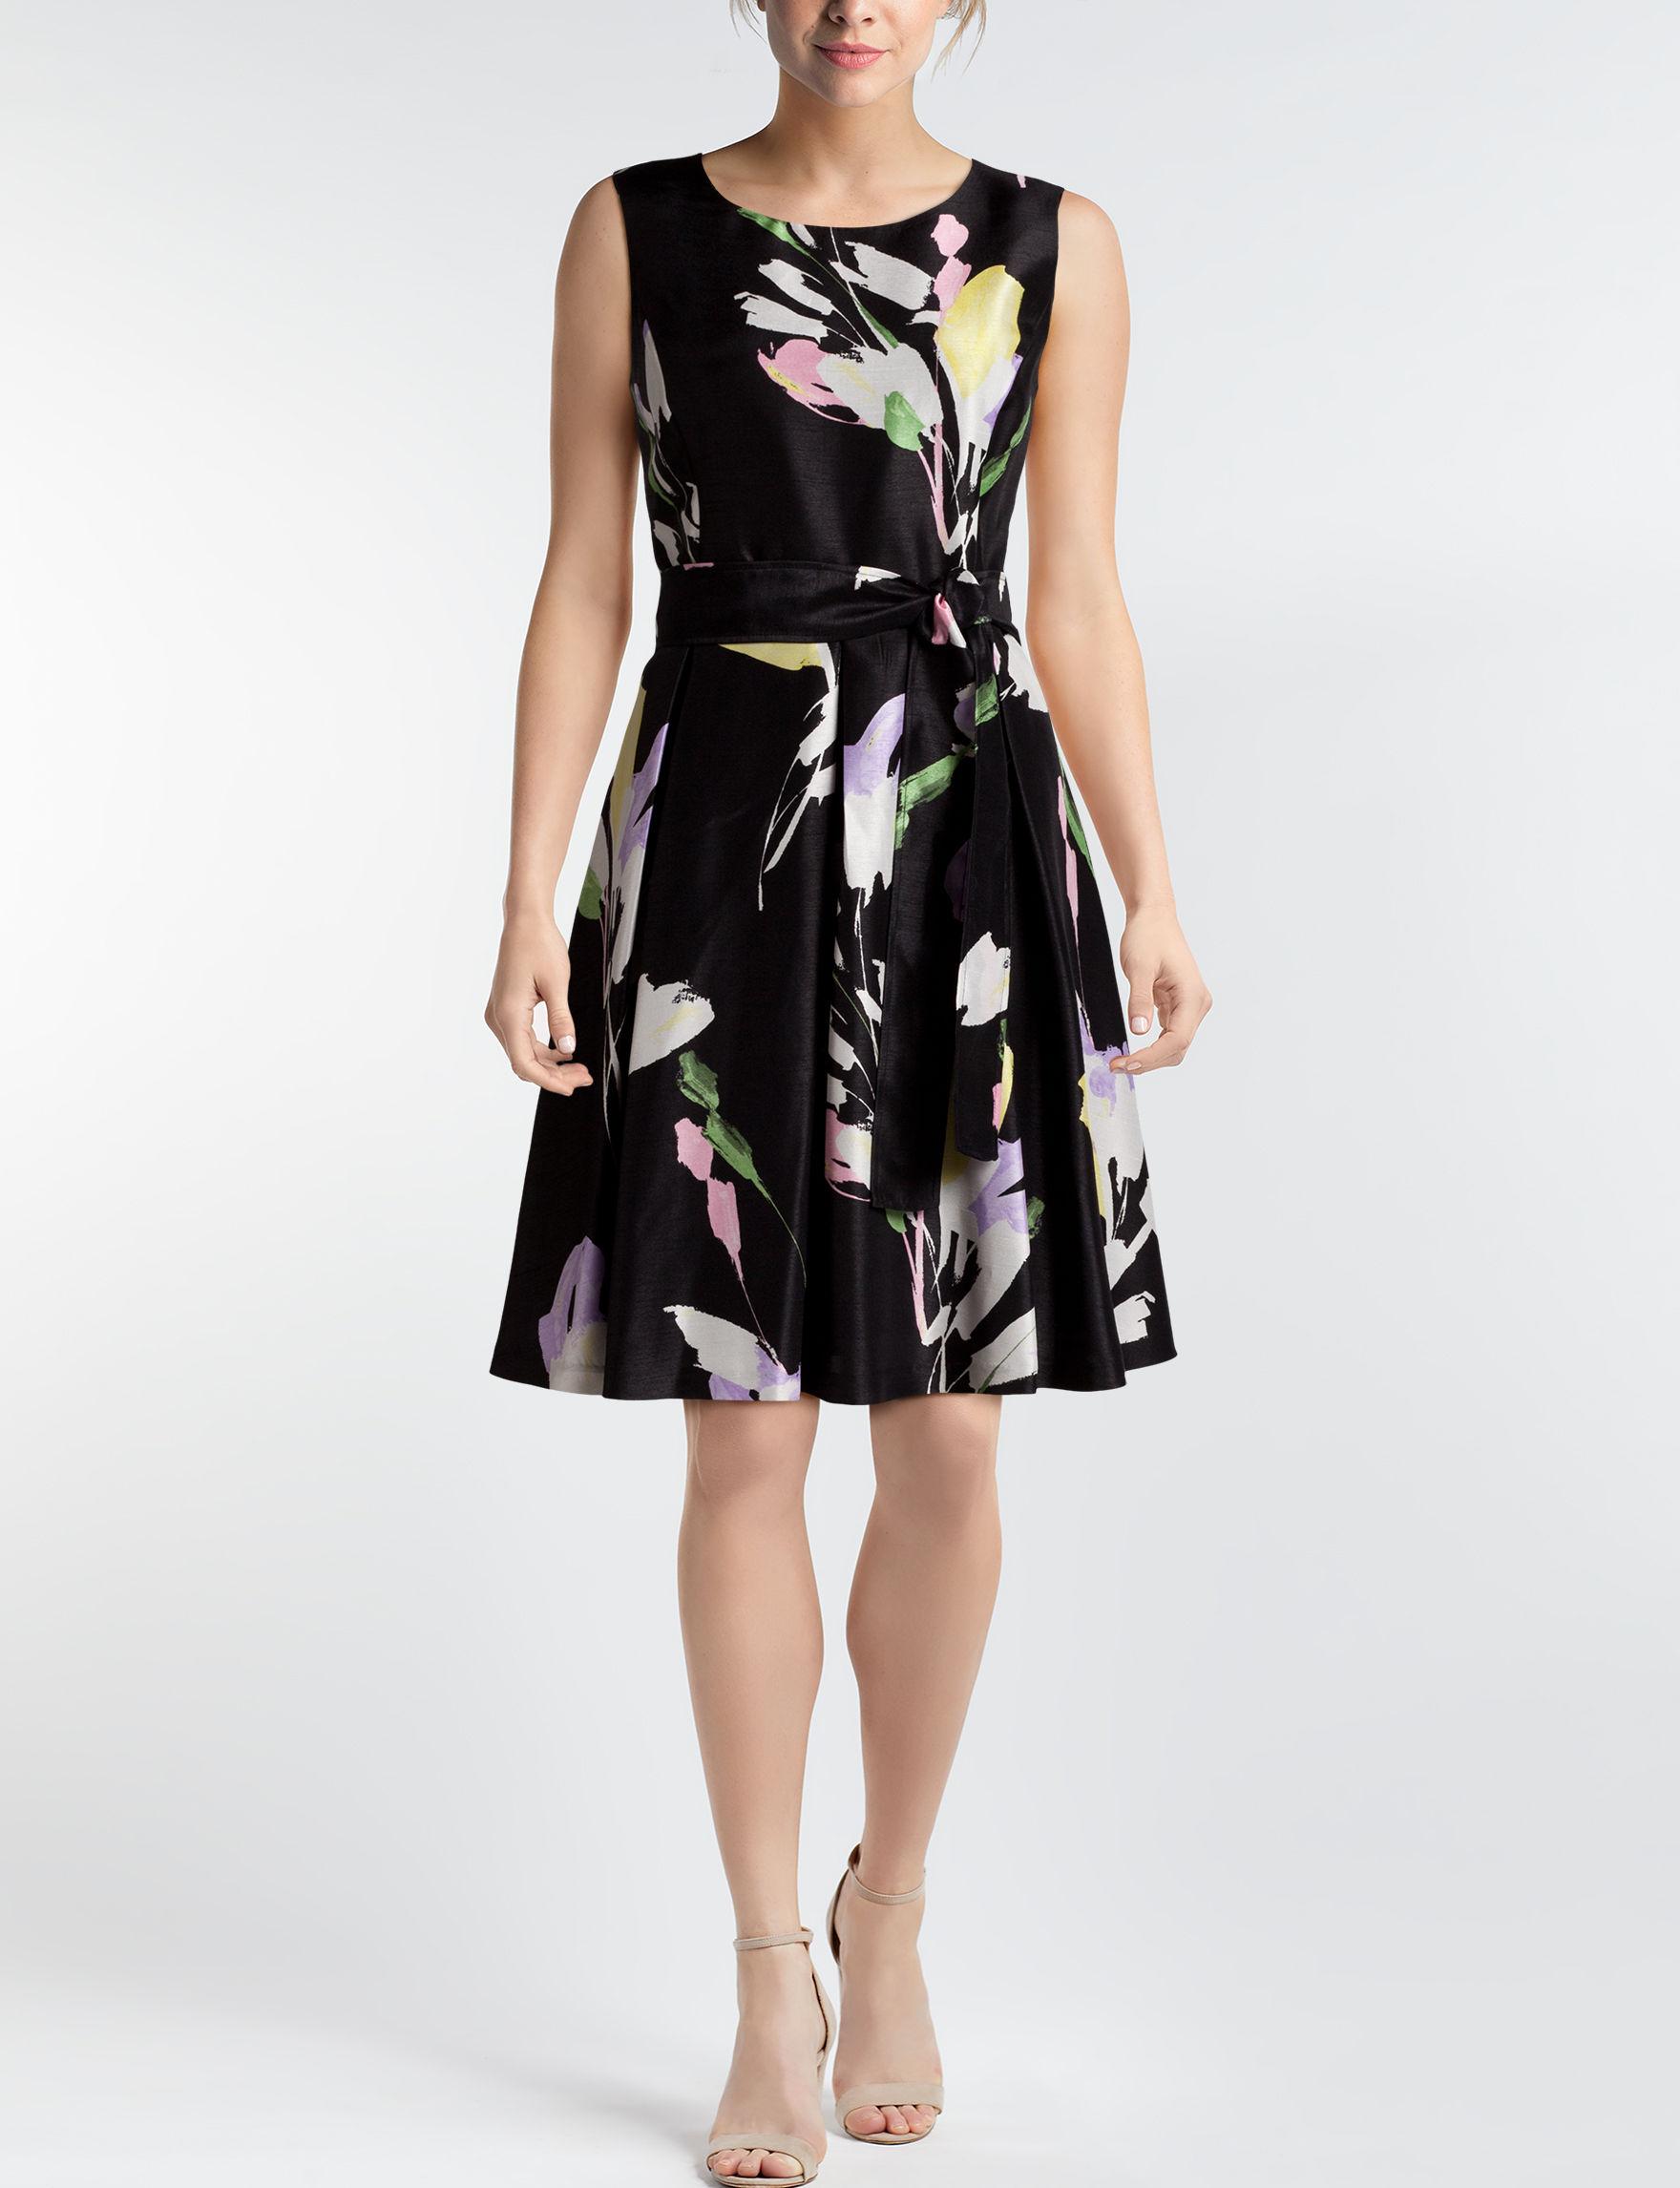 Nine West Black Everyday & Casual A-line Dresses